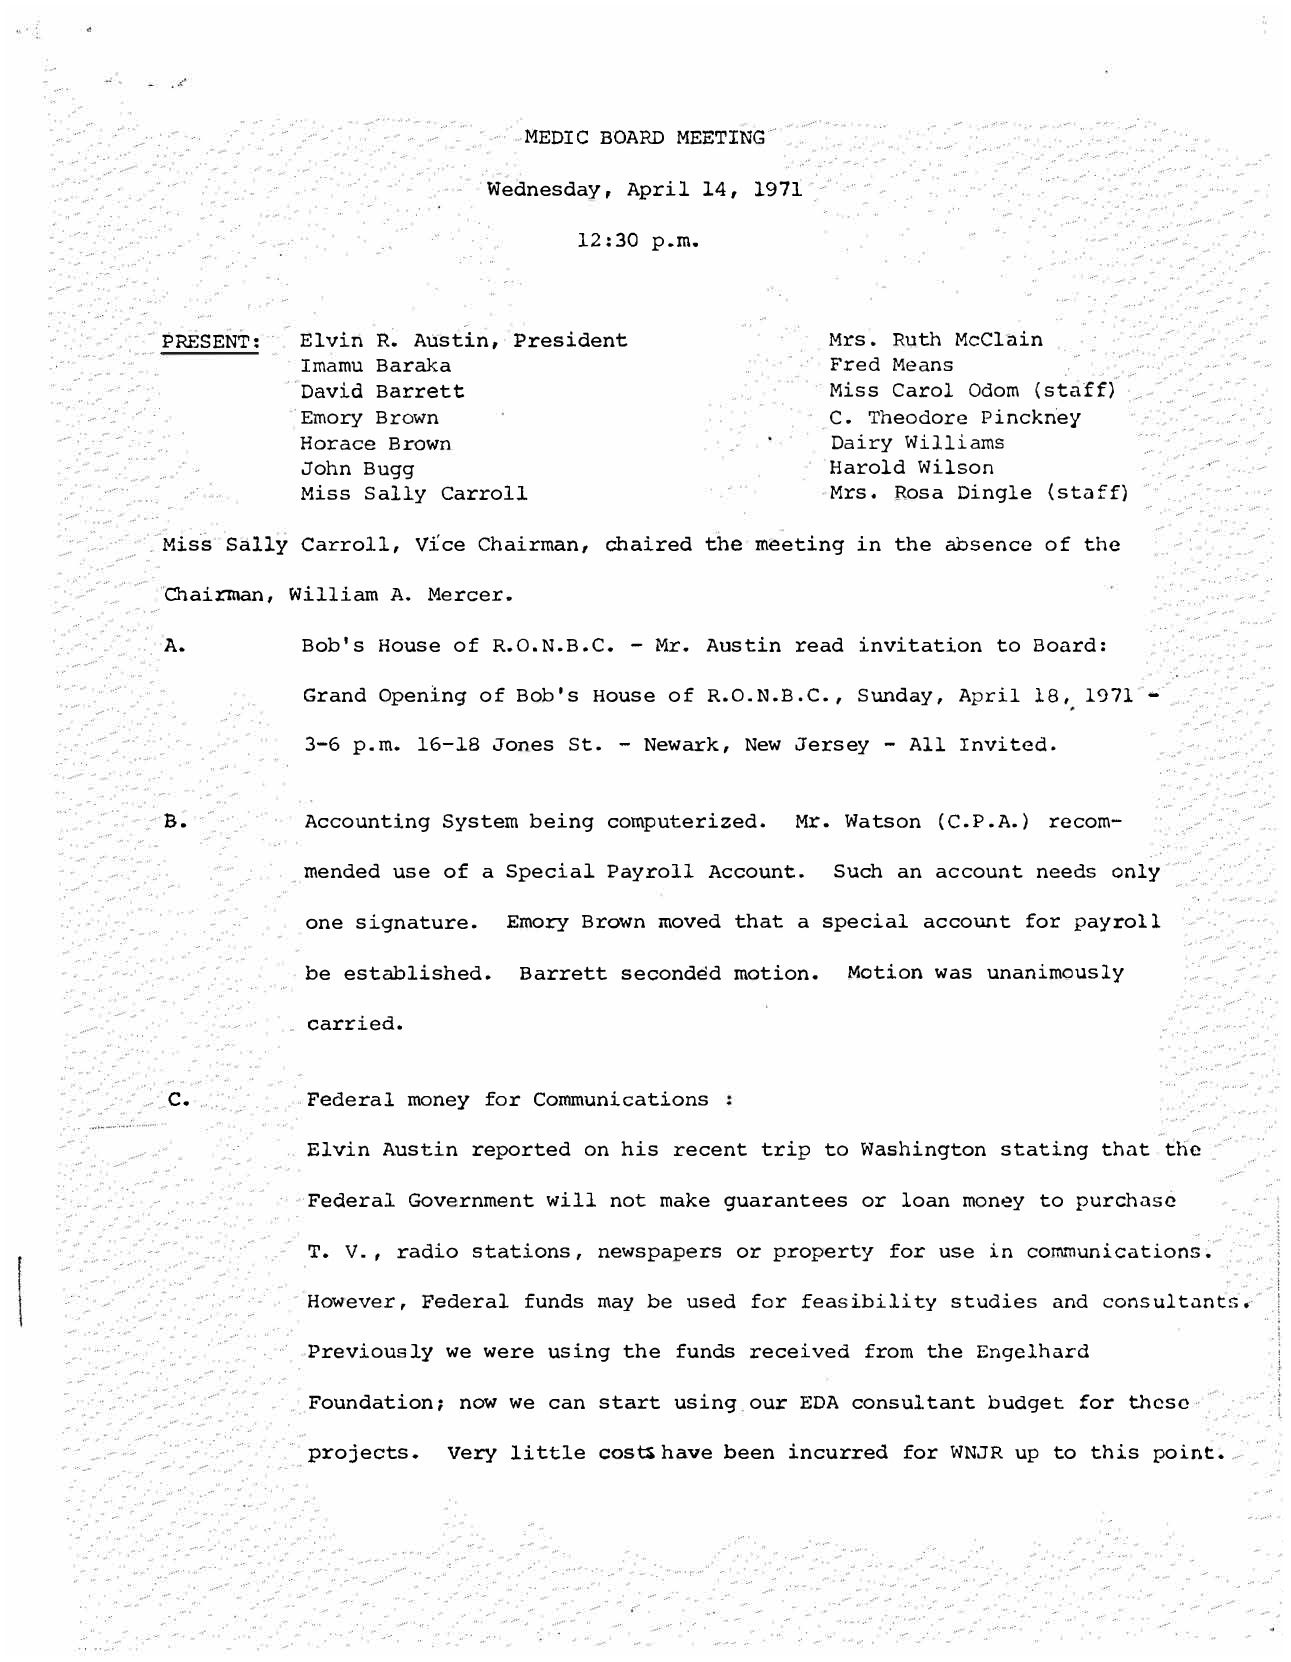 MEDIC Board Meeting Minutes (April 1971)